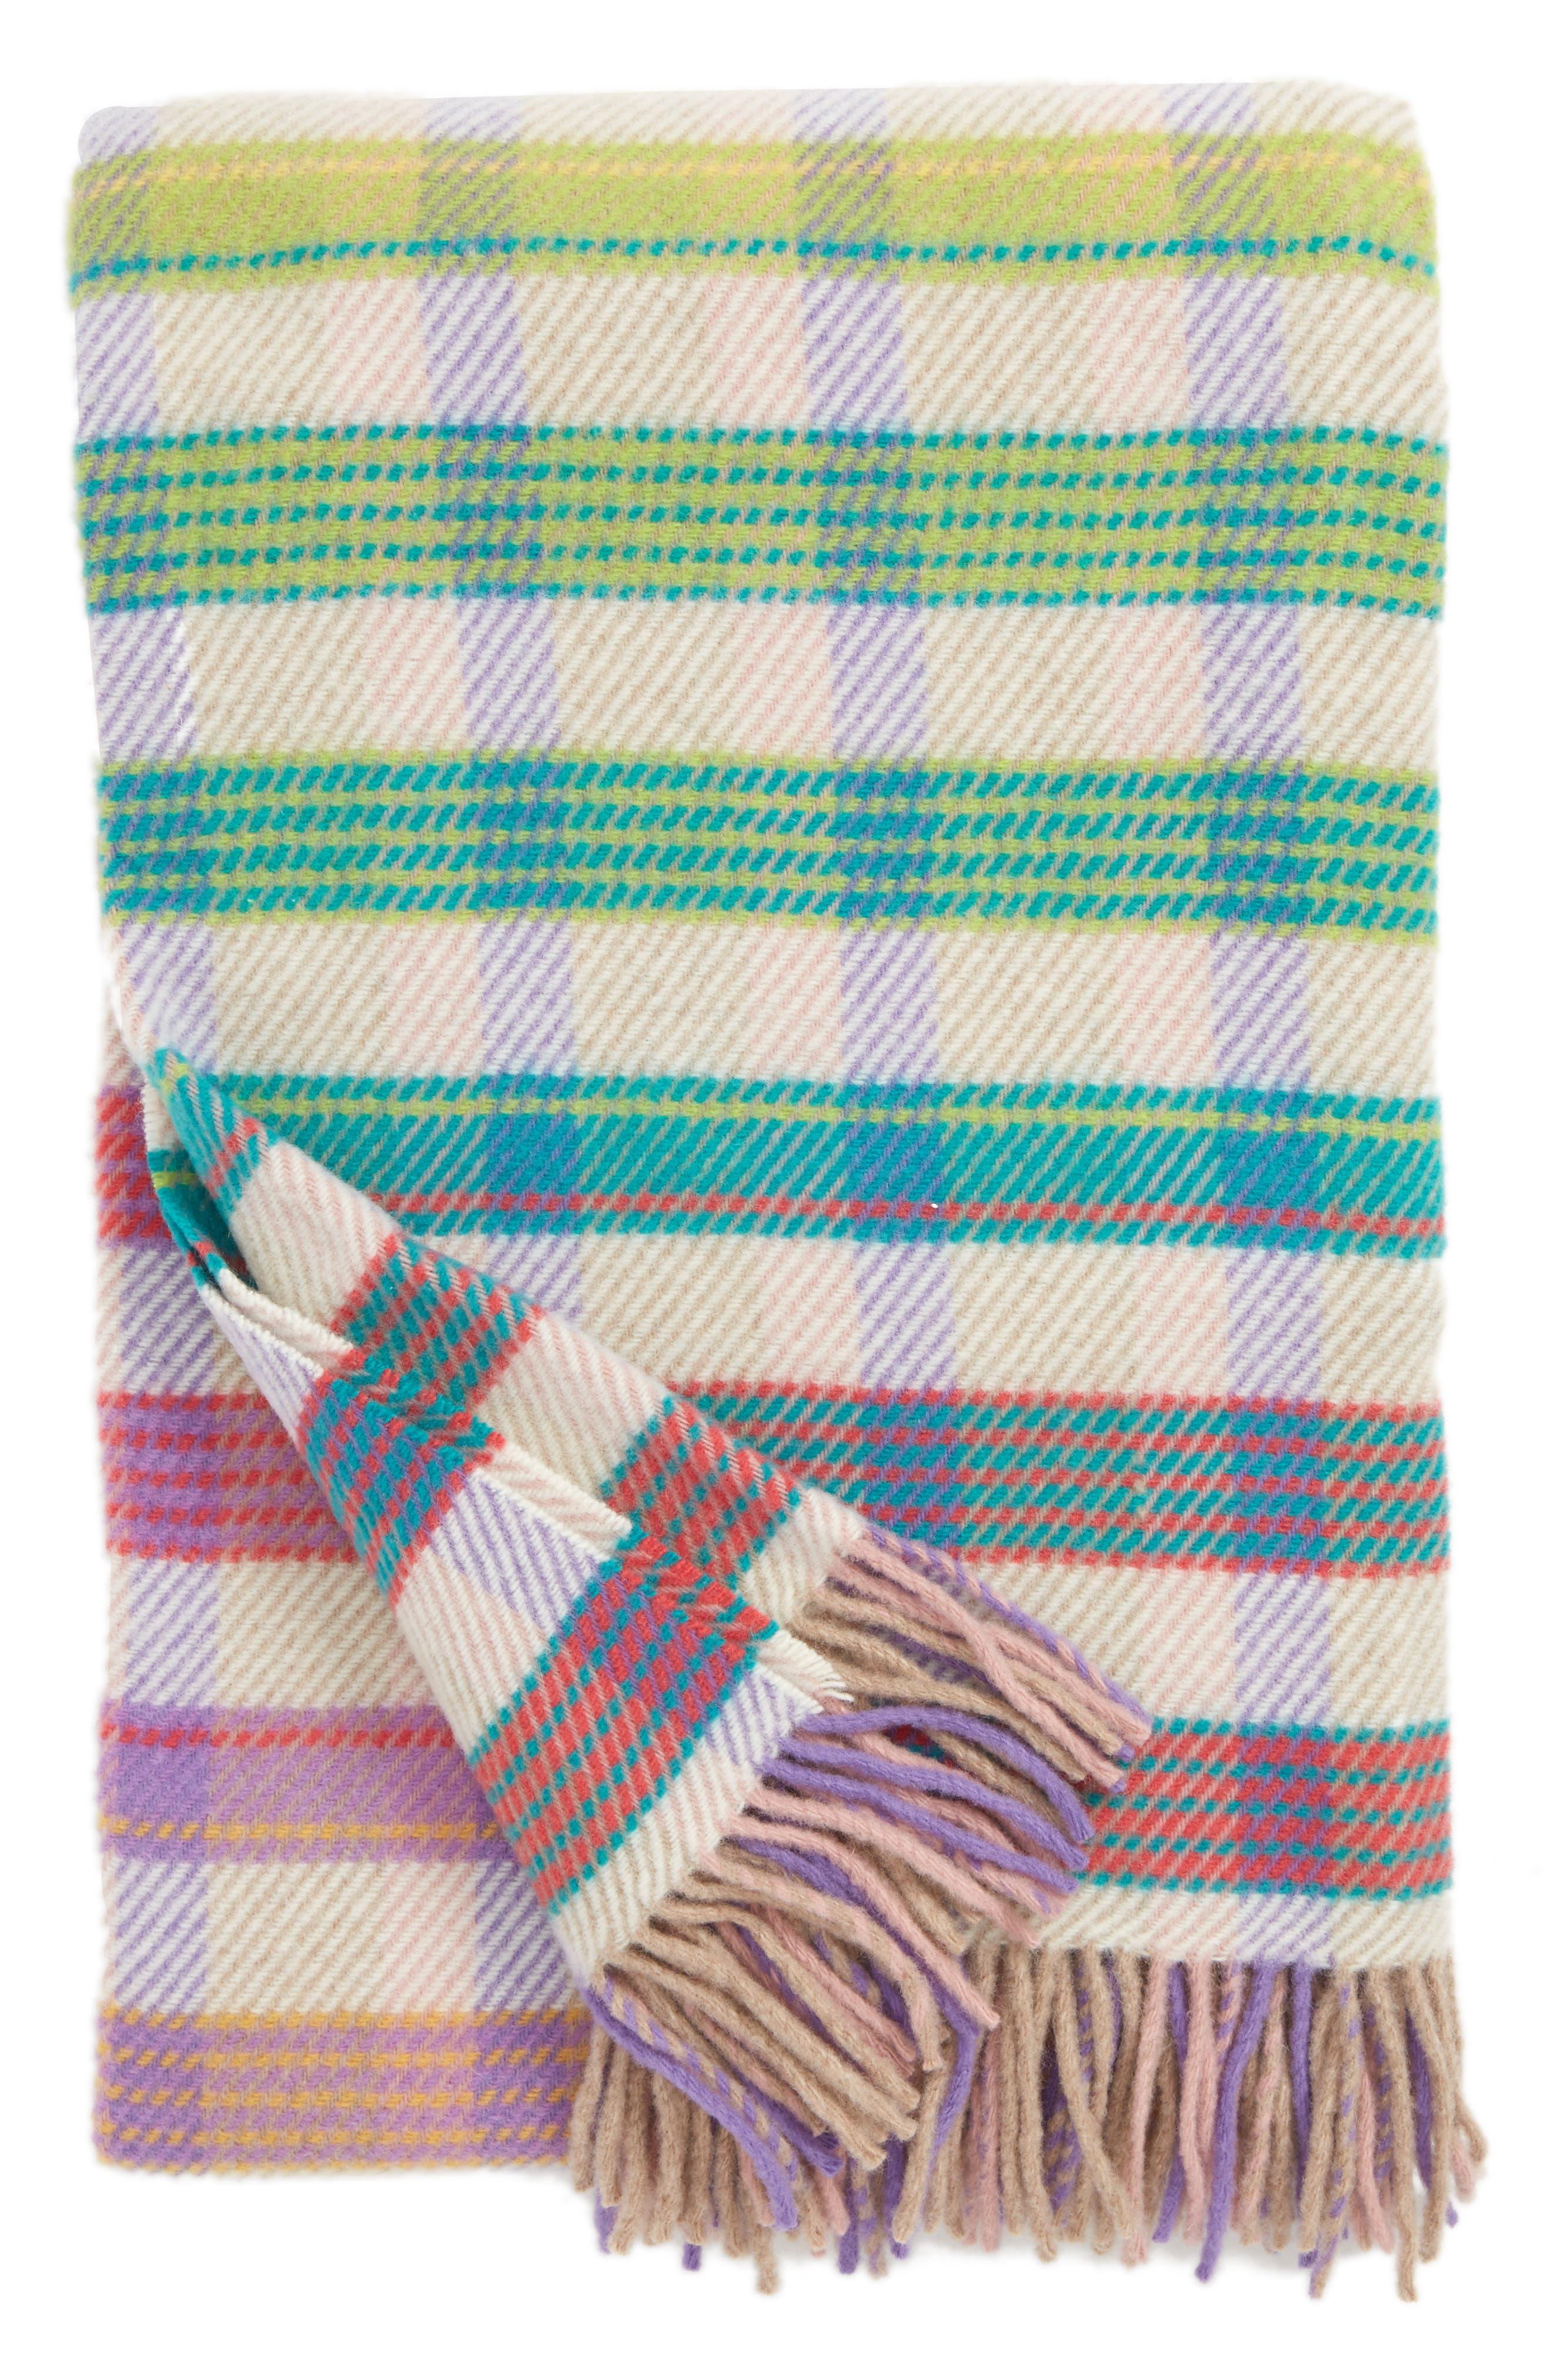 Missoni Tiziano Wool Throw Blanket